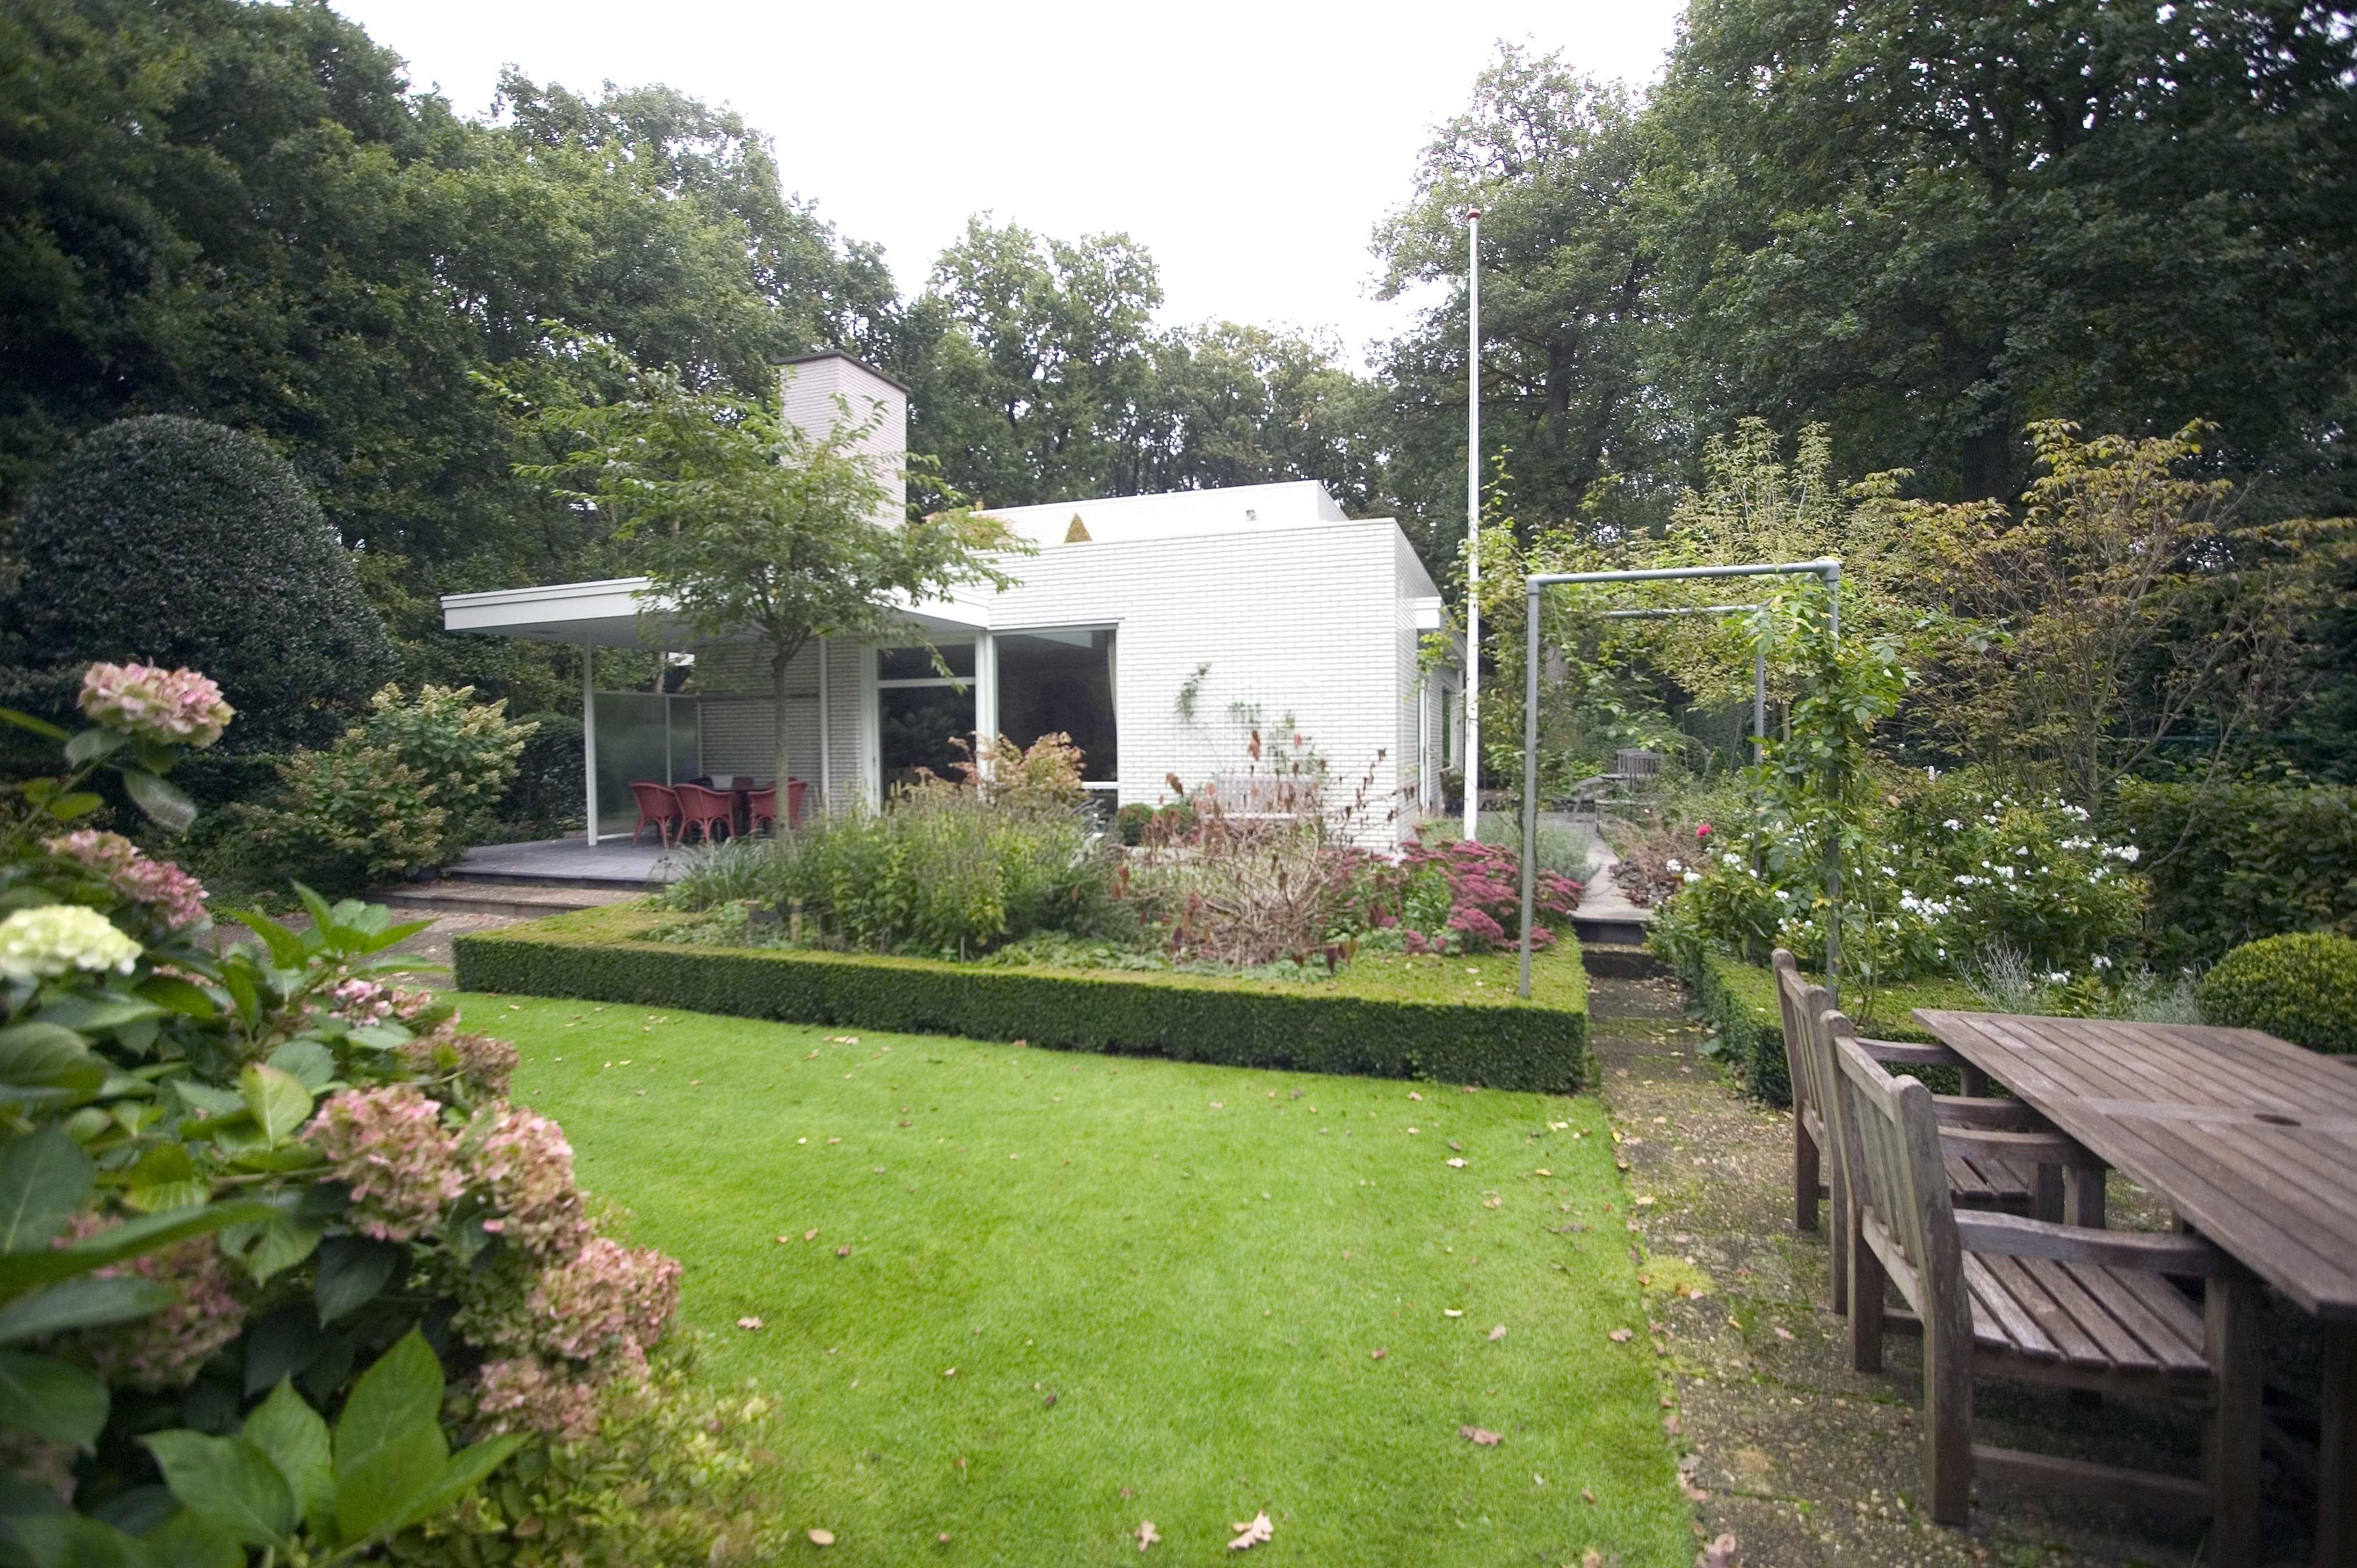 Tuin tuinontwerp tuinarchitect hovenier hoveniersbedrijf tuinaanleg